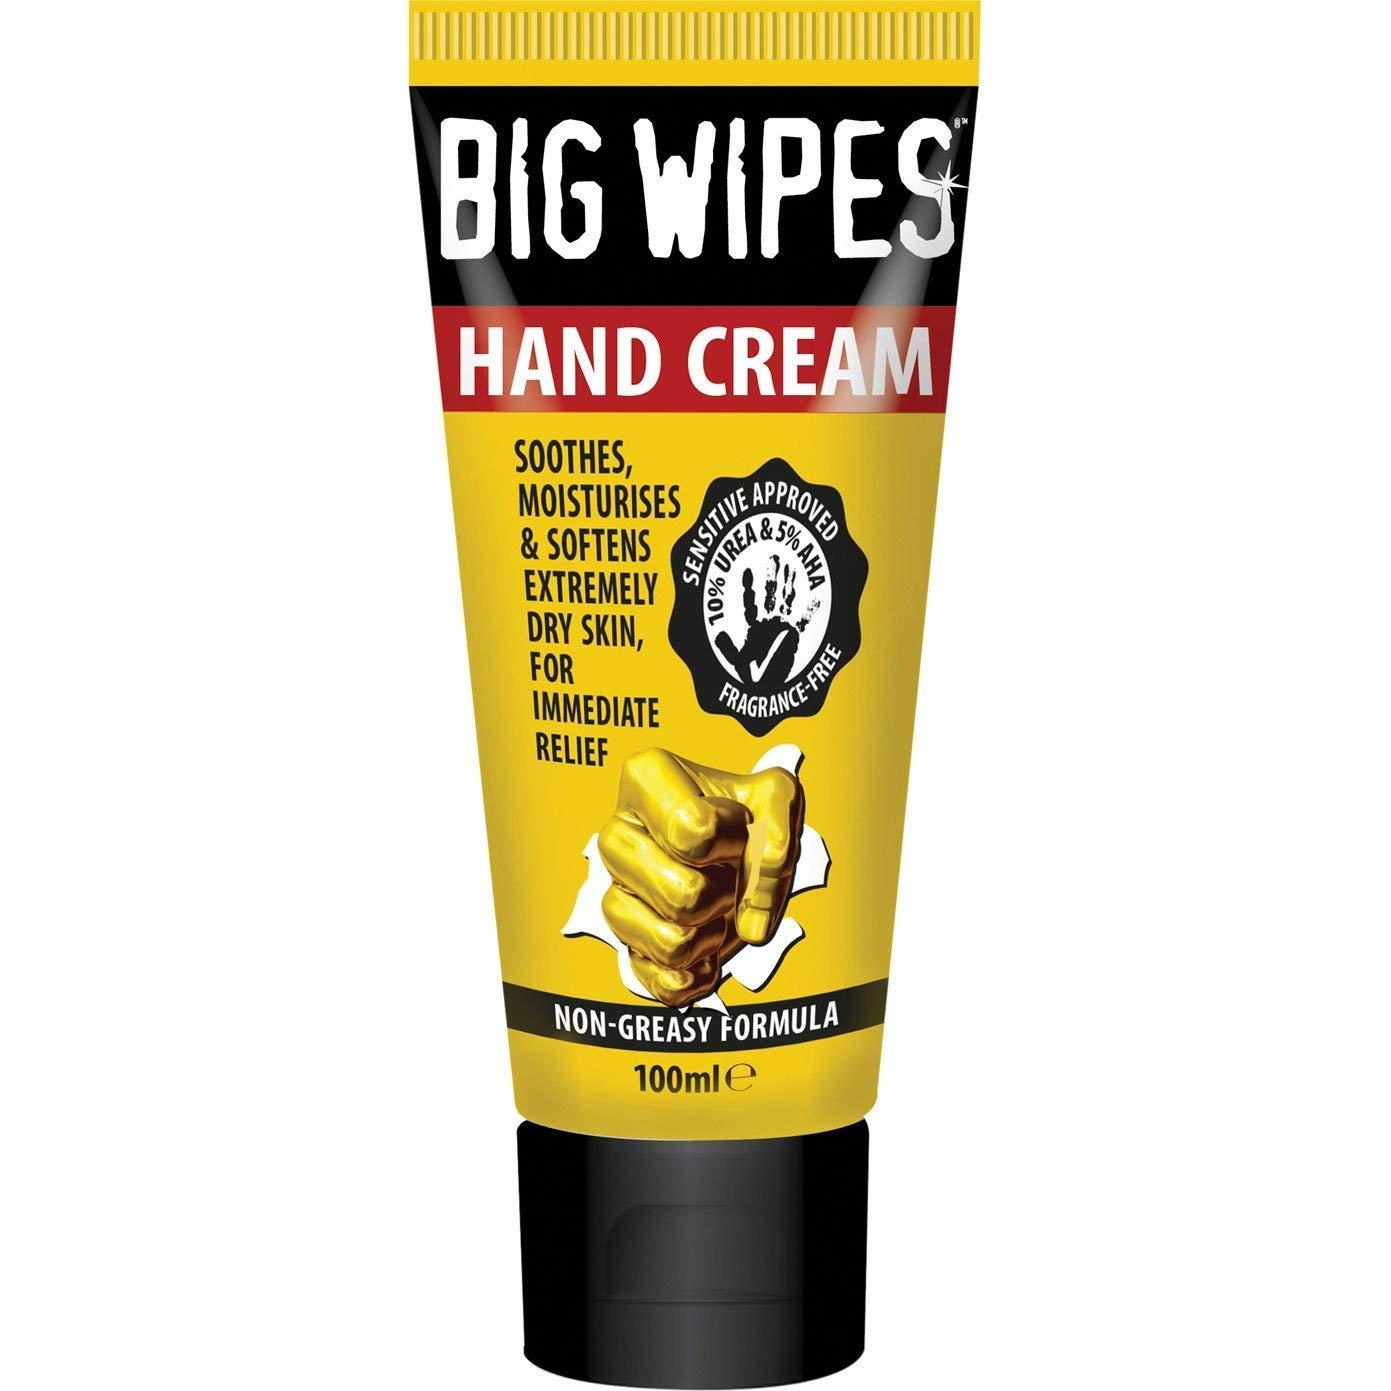 Big Wipes Hand Cream Tube 100ml, (Sensitive Approved, 10% Urea & 5% AHA, Fragrance-Free), Non-Greasy Formula, £1, In Store @ Poundland